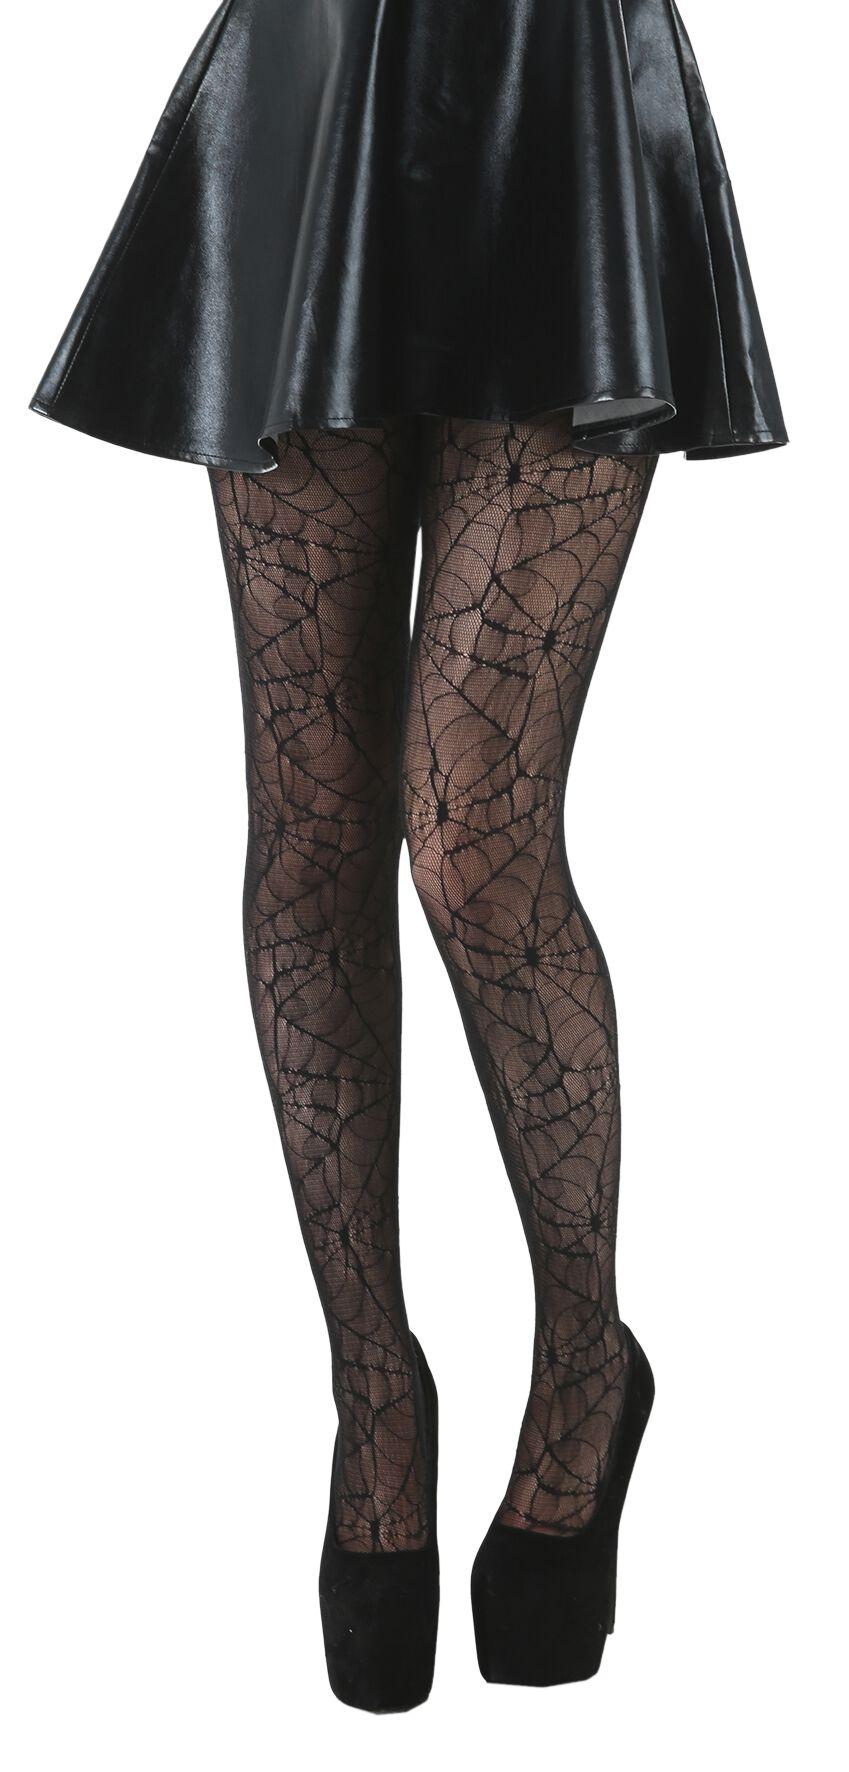 Strumpfhosen - Pamela Mann Cobweb Lace Strumpfhose schwarz  - Onlineshop EMP